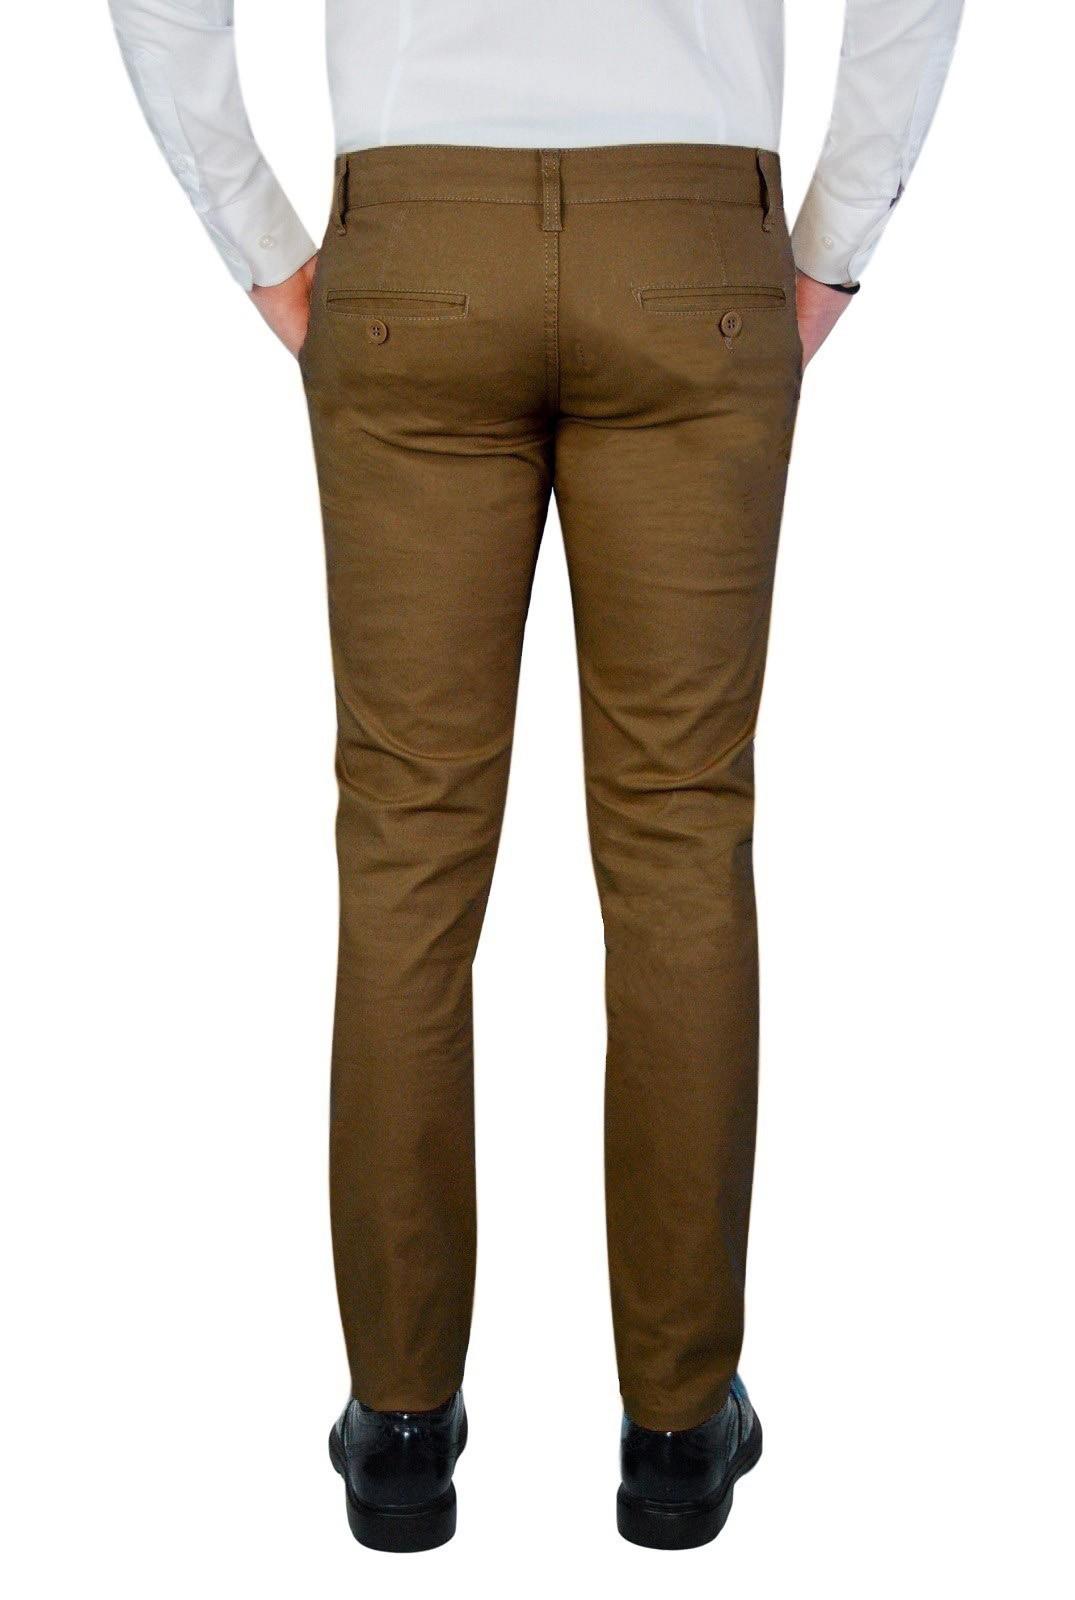 Pantalone-Uomo-Chino-Primaverile-slim-fit-Pantaloni-Eleganti-Blu-Verde-Nero miniatura 29